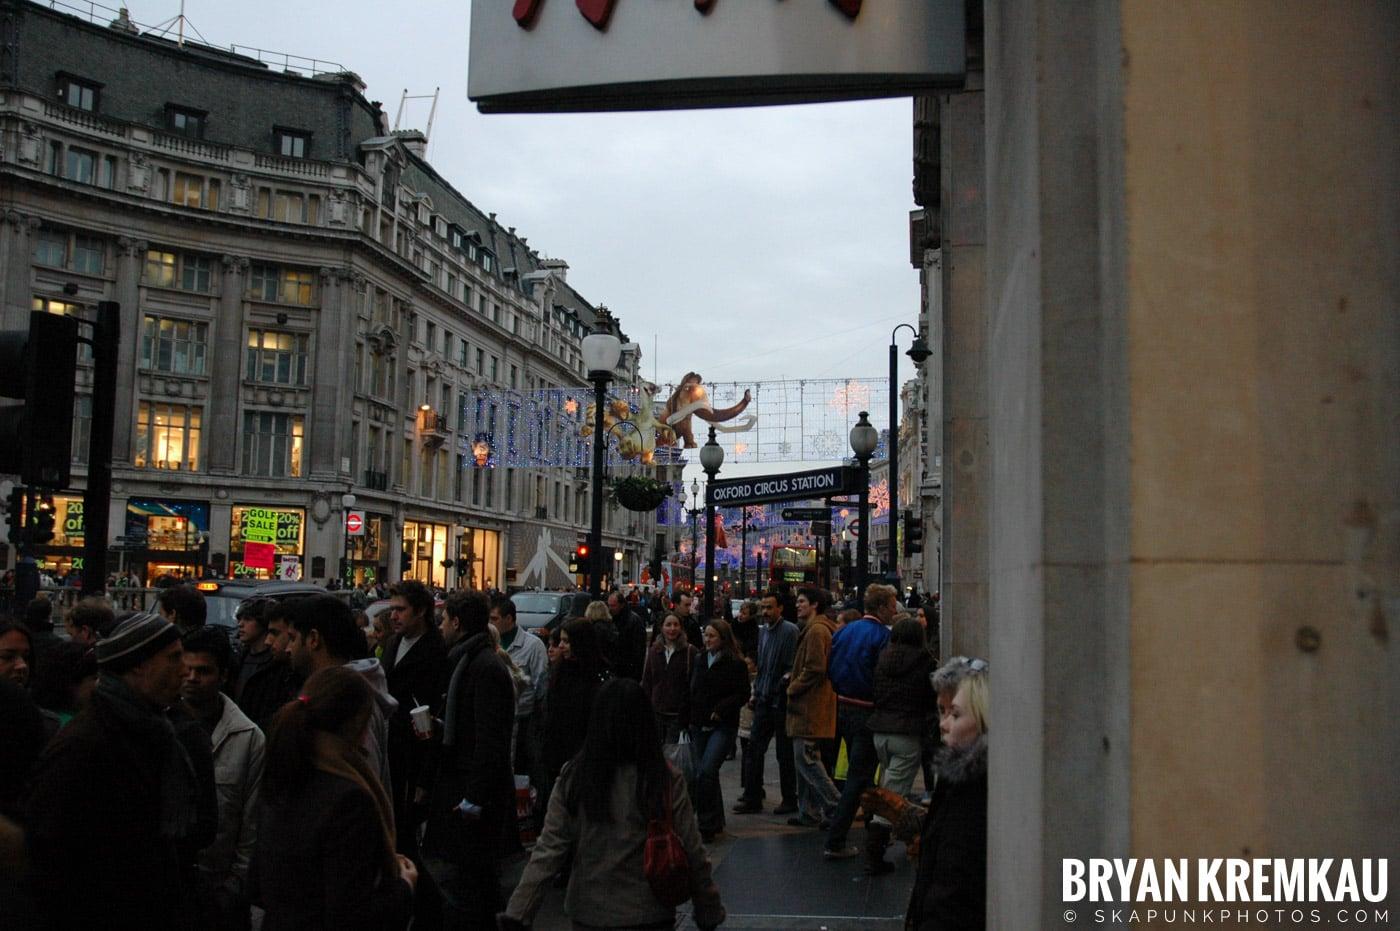 London, England - Day 3 - 12.18.05 (20)